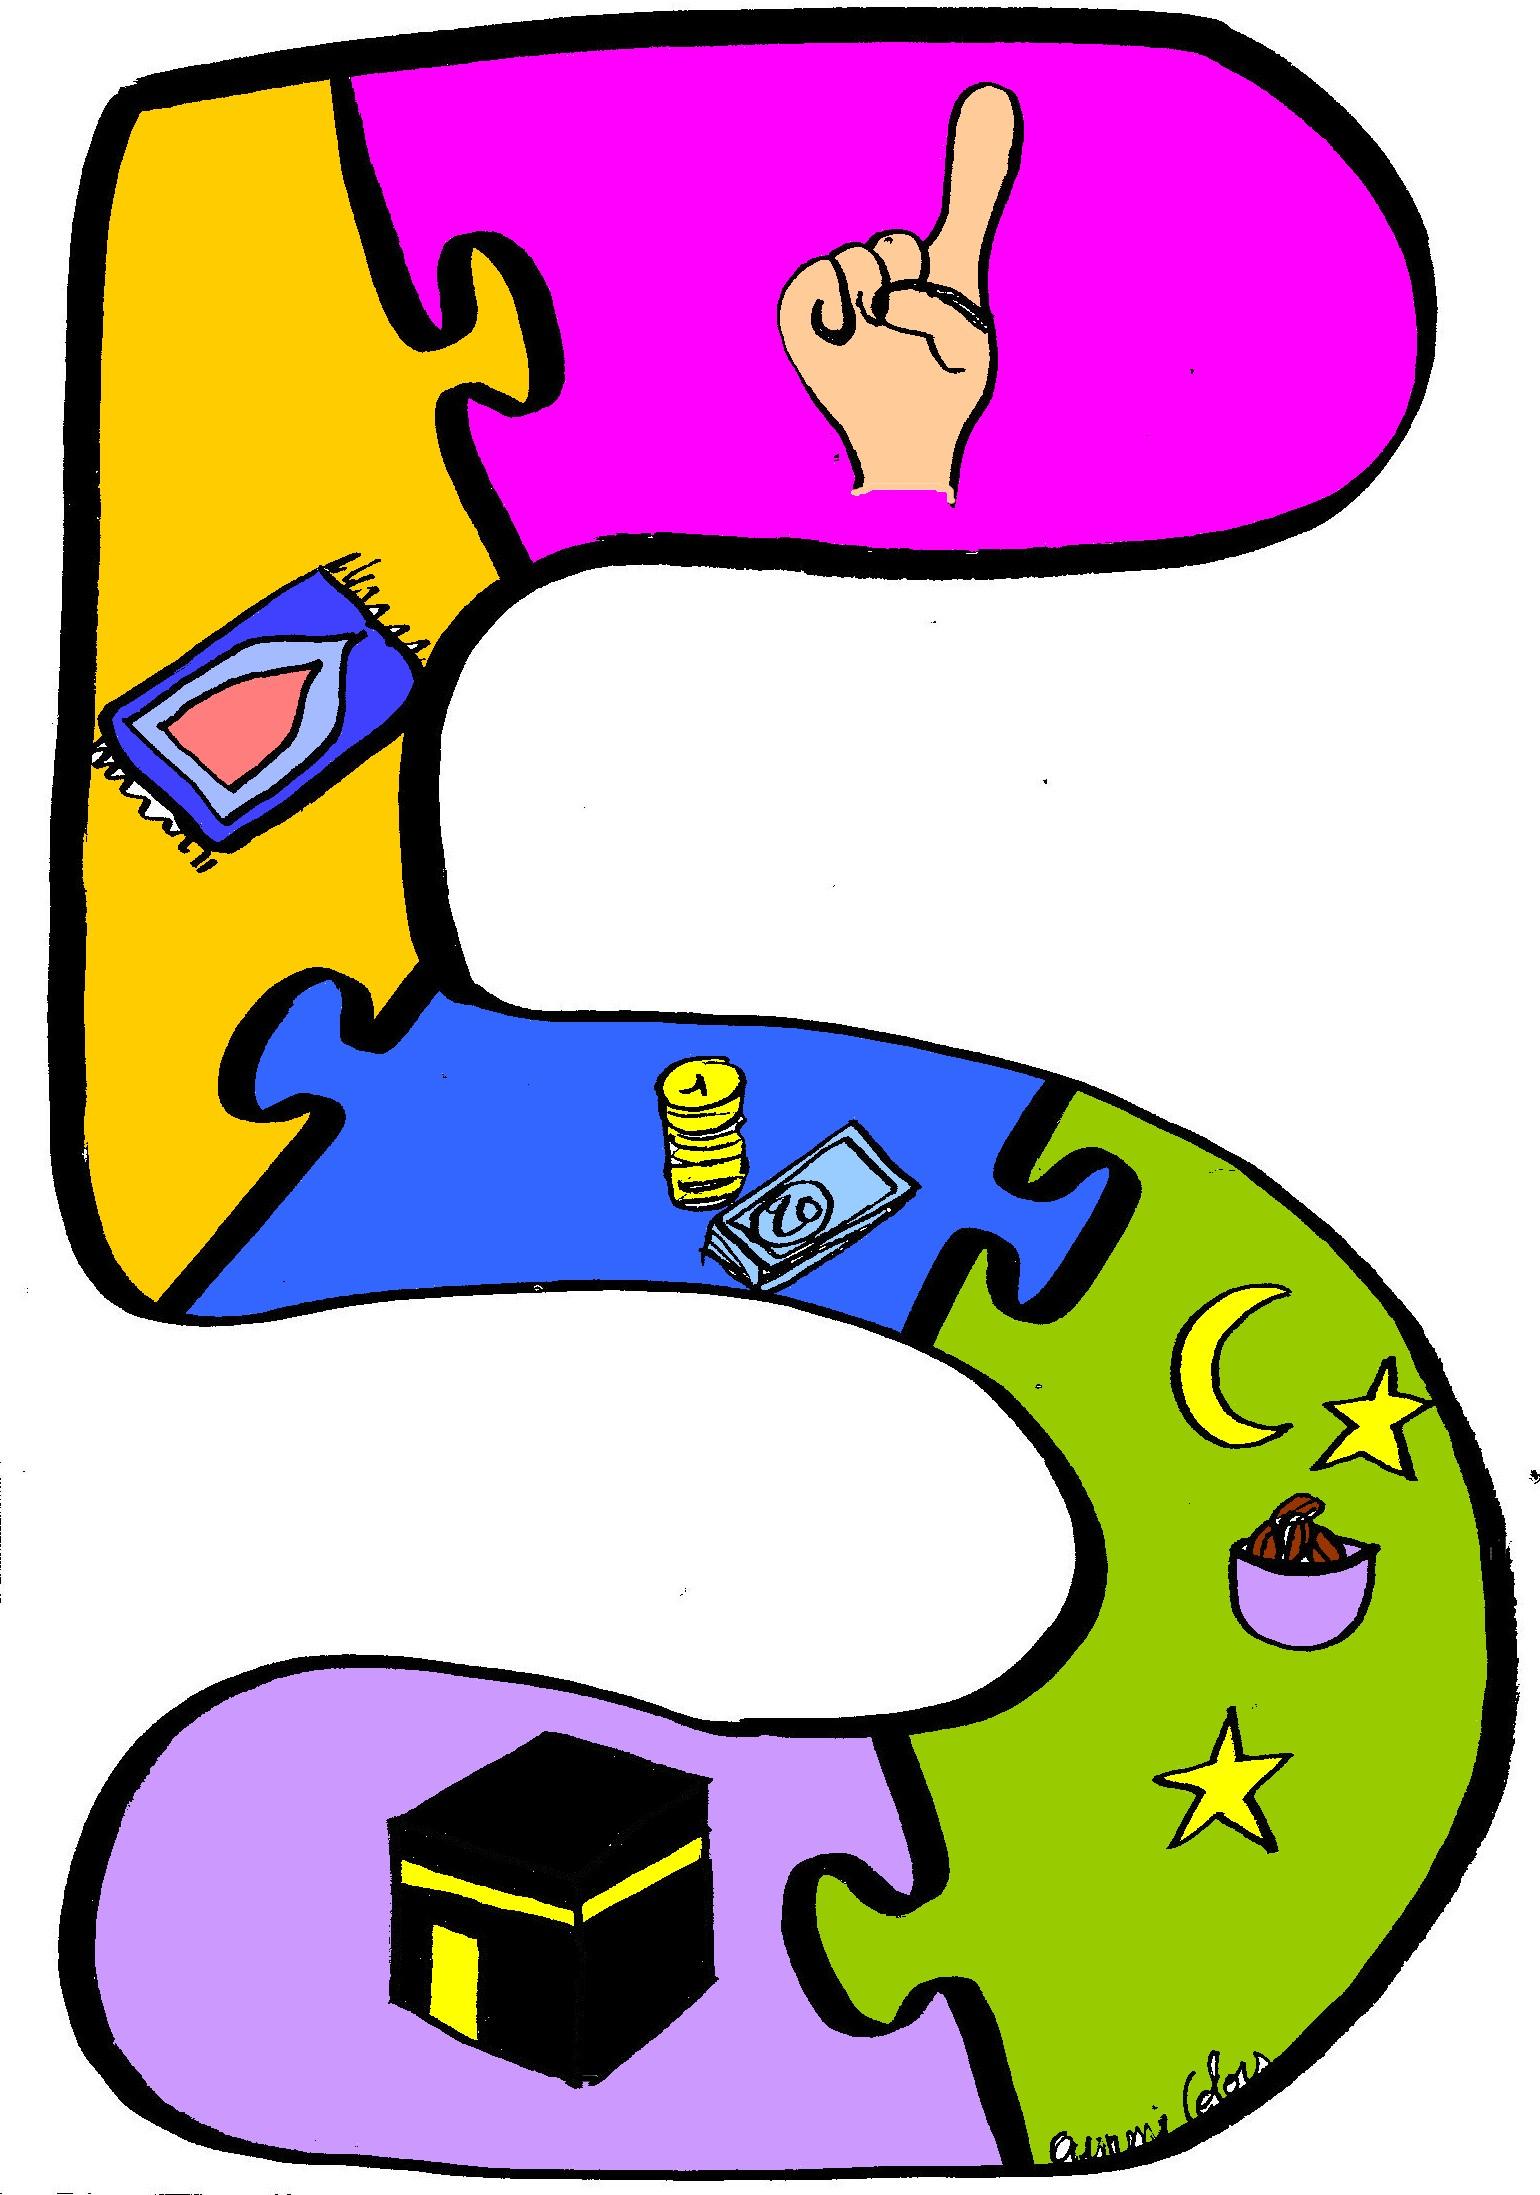 5 Pilliers De L Islam : pilliers, islam, Activités, Pilliers, L'Islam